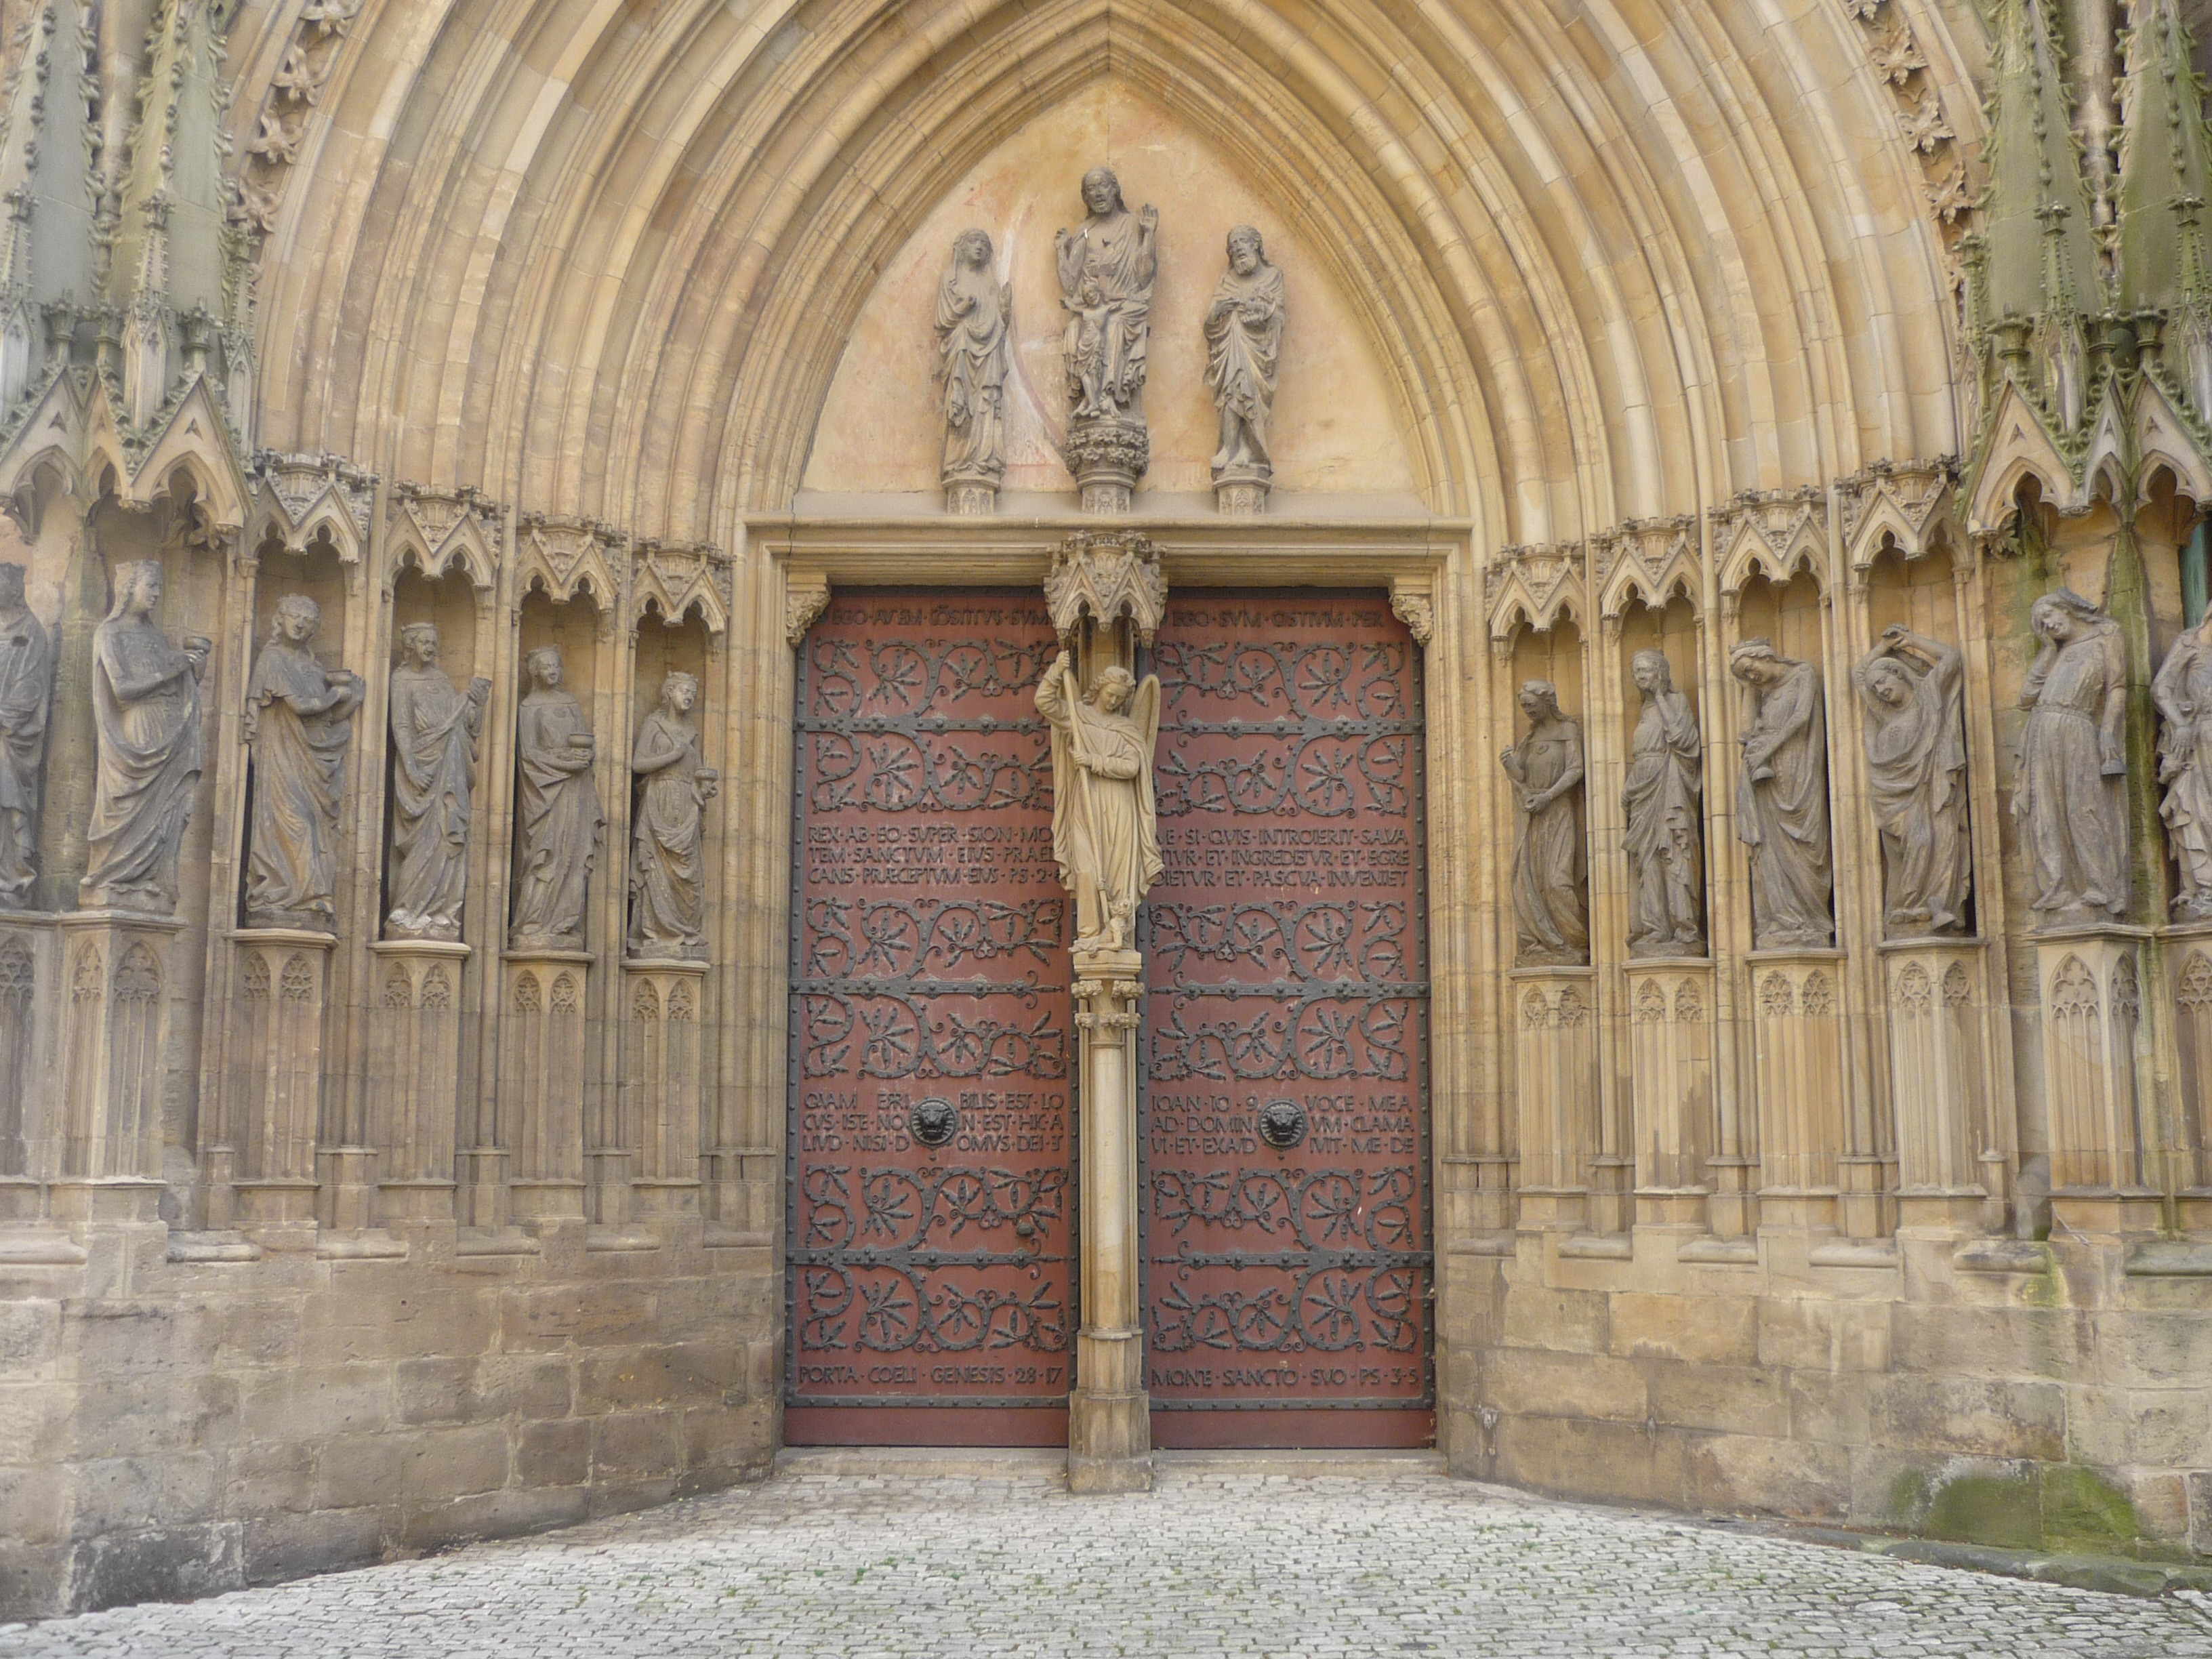 File:Erfurt Cathedral Doors Full.JPG & File:Erfurt Cathedral Doors Full.JPG - Wikipedia Pezcame.Com